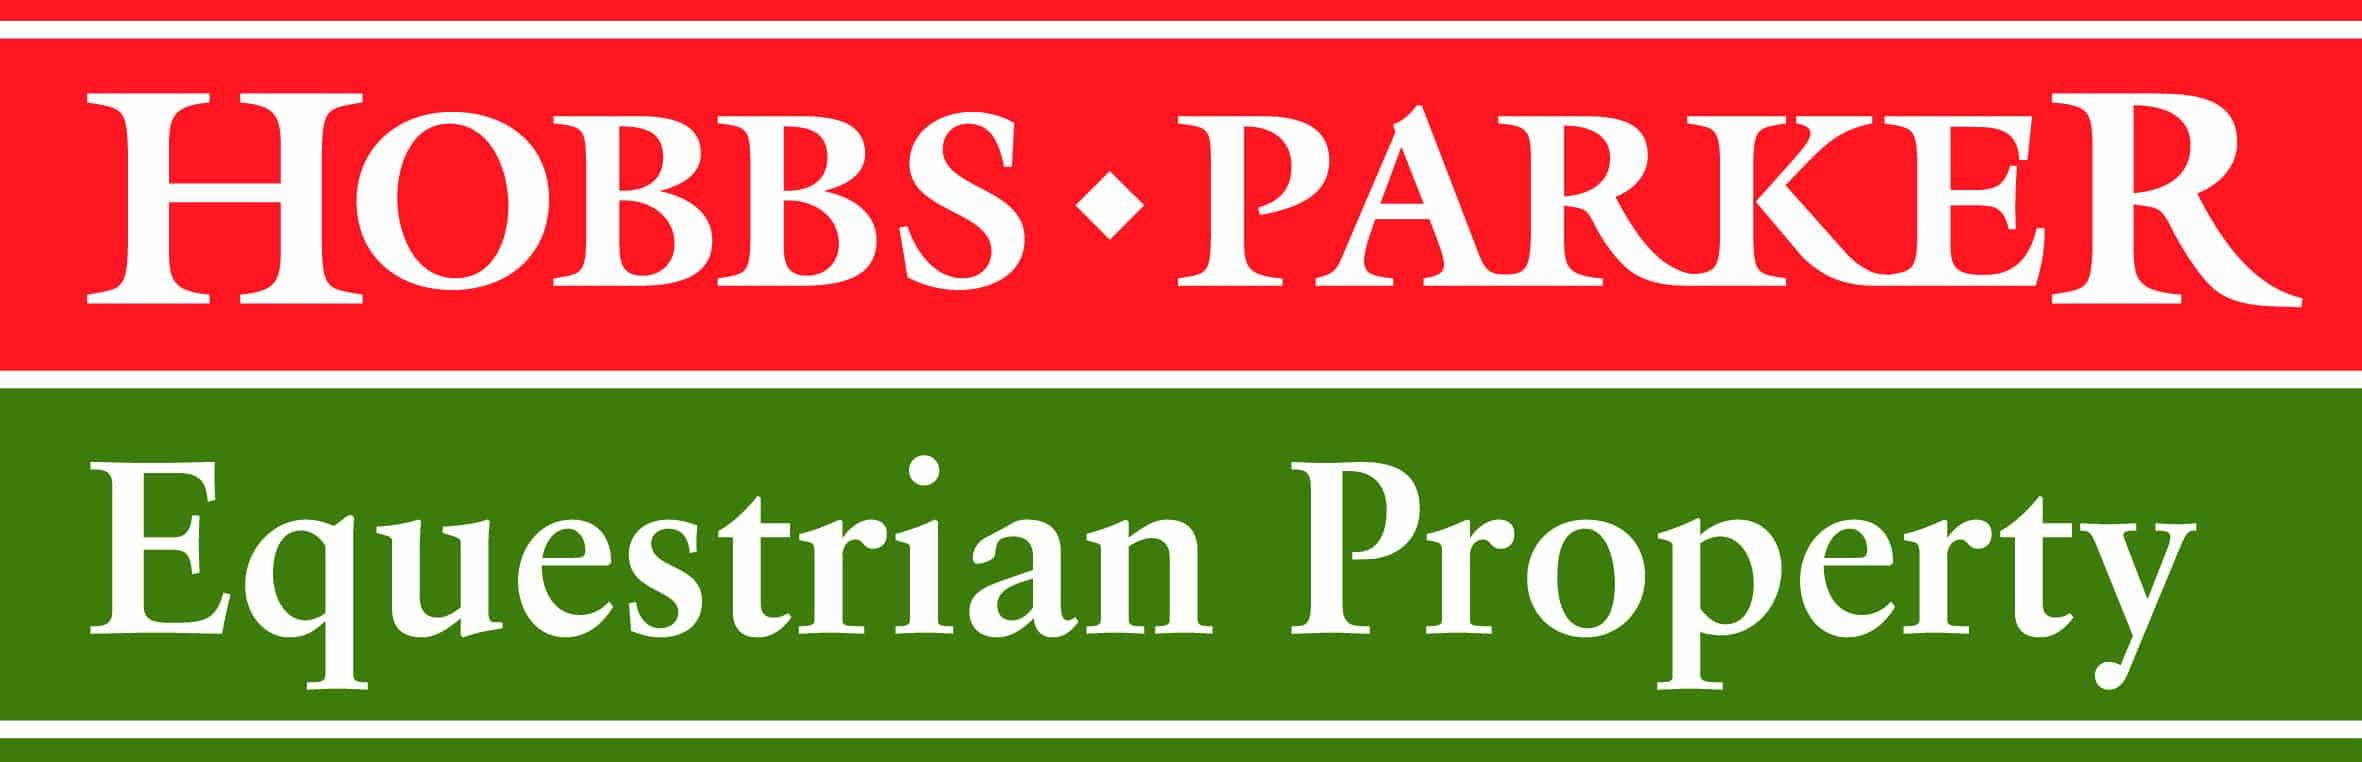 Hobbs Parker Equestrian Property Logo